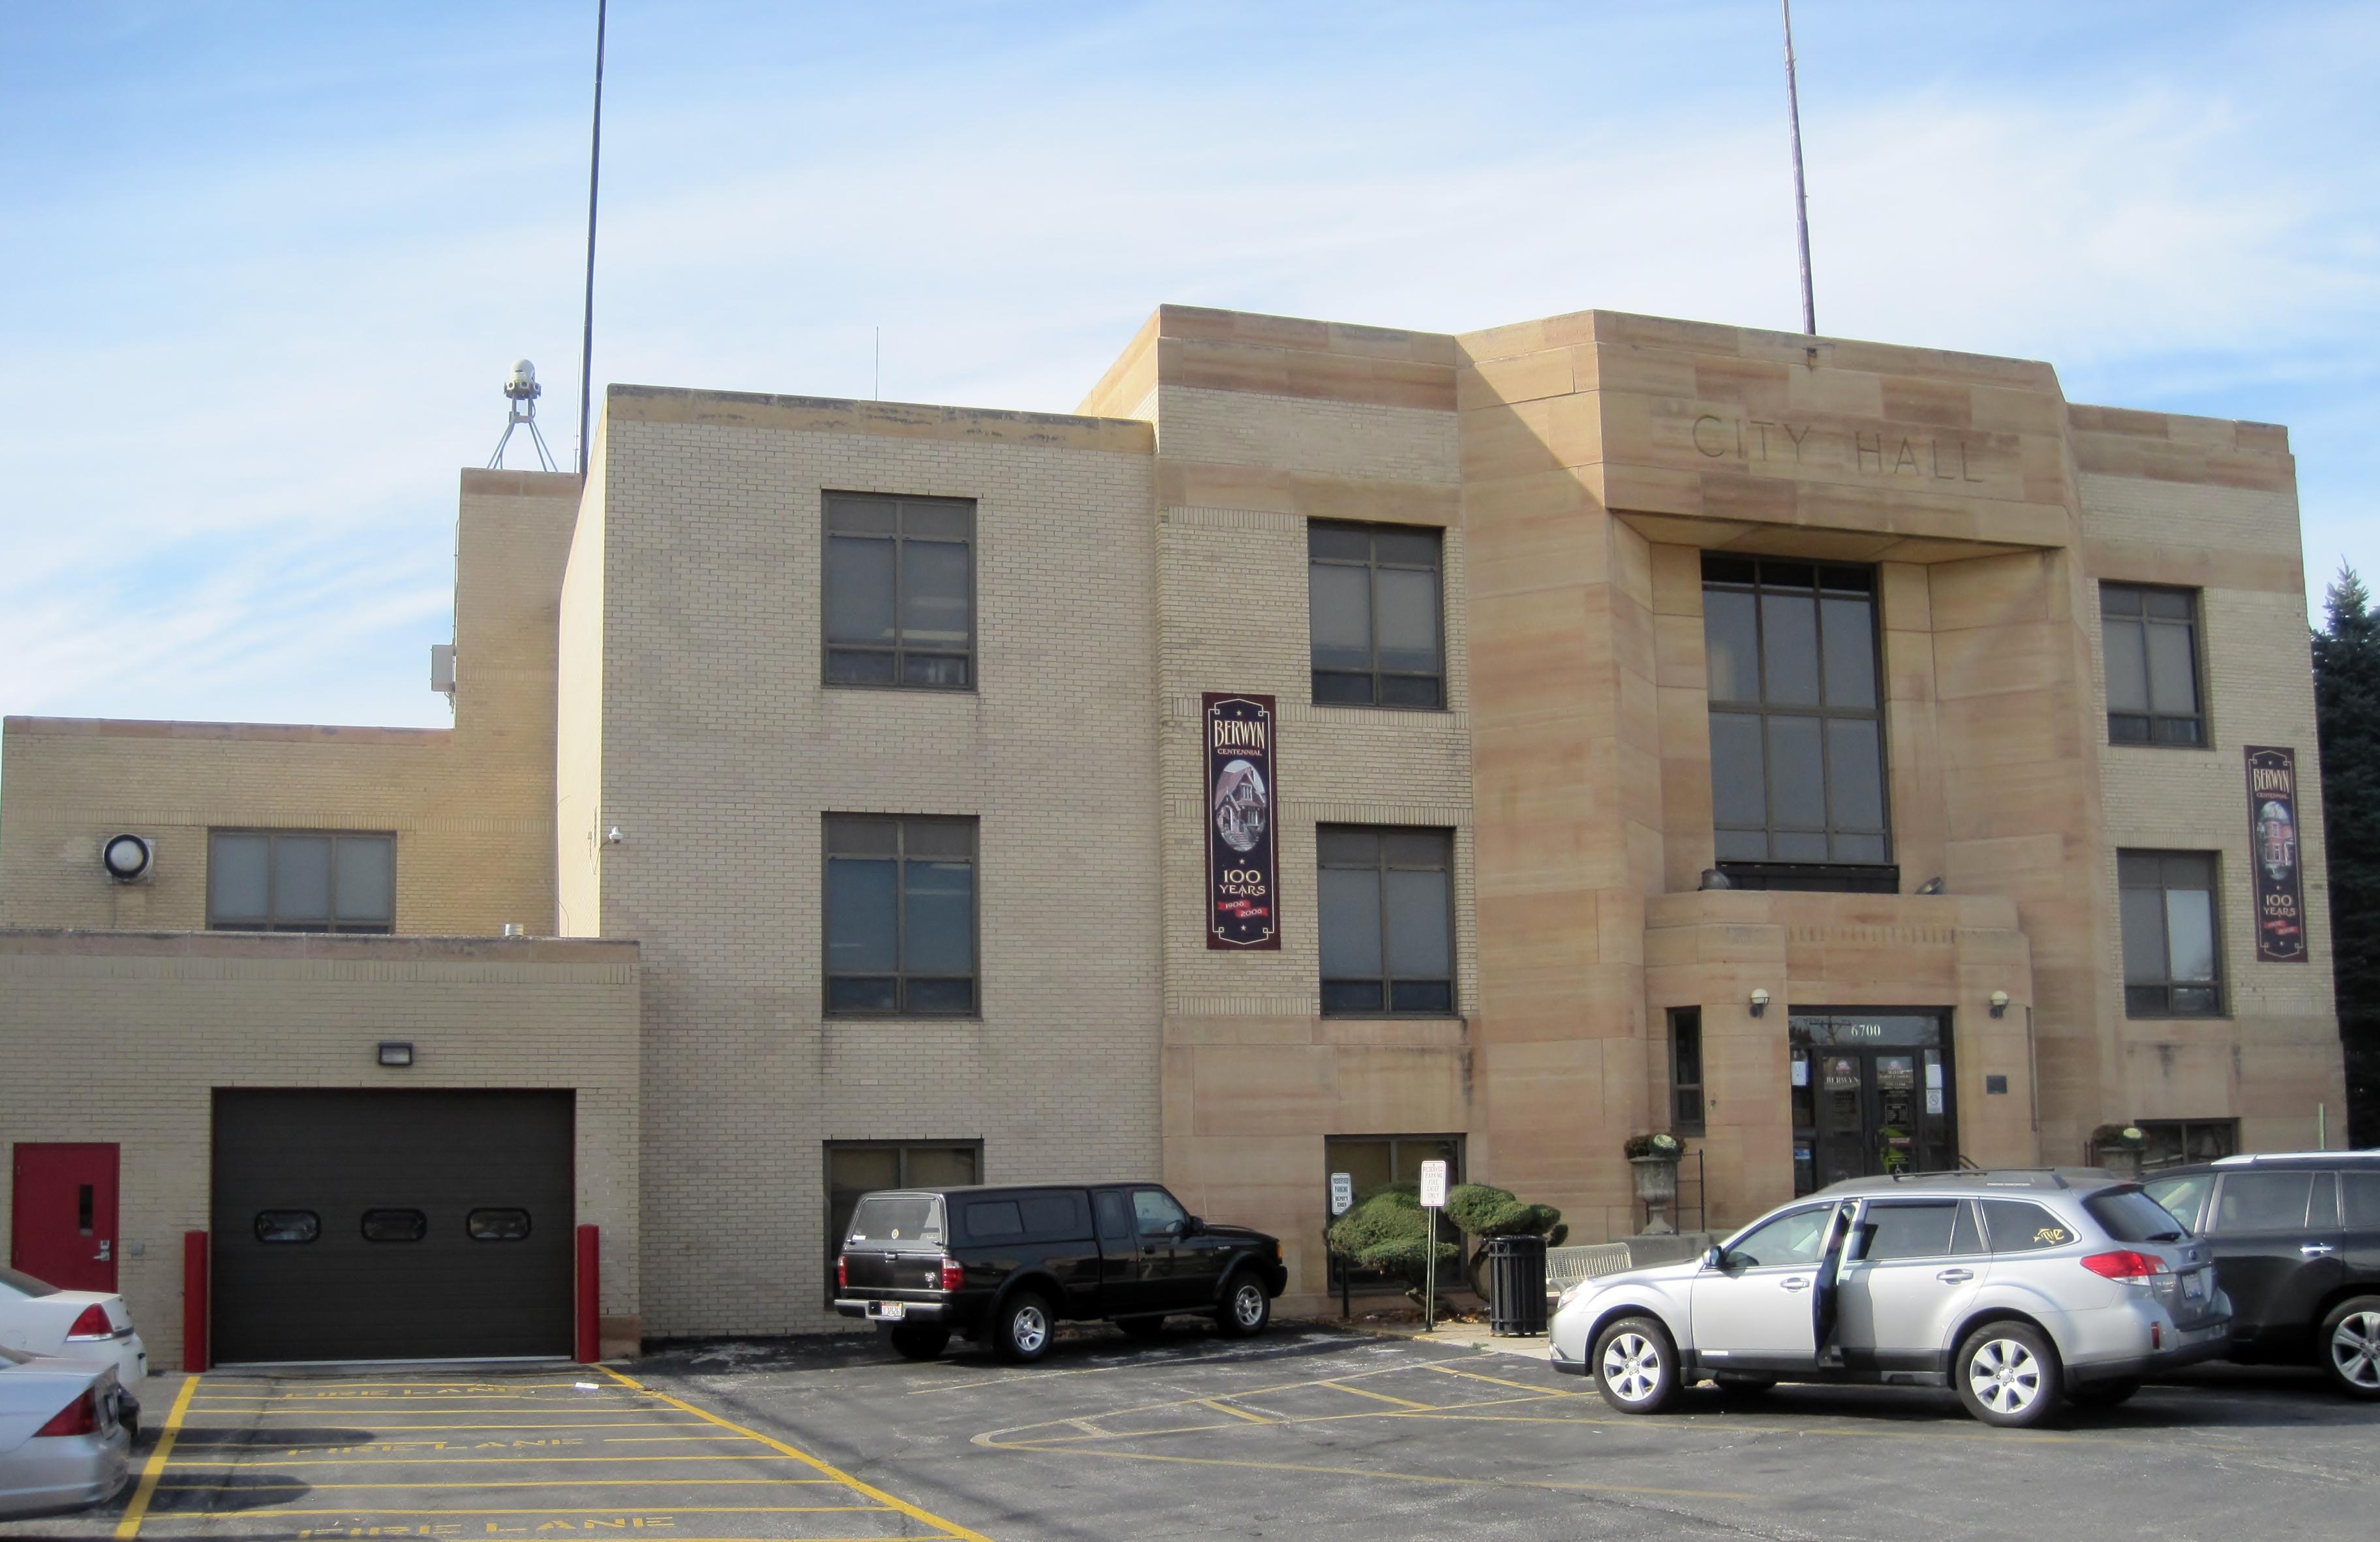 Berwyn City Hall